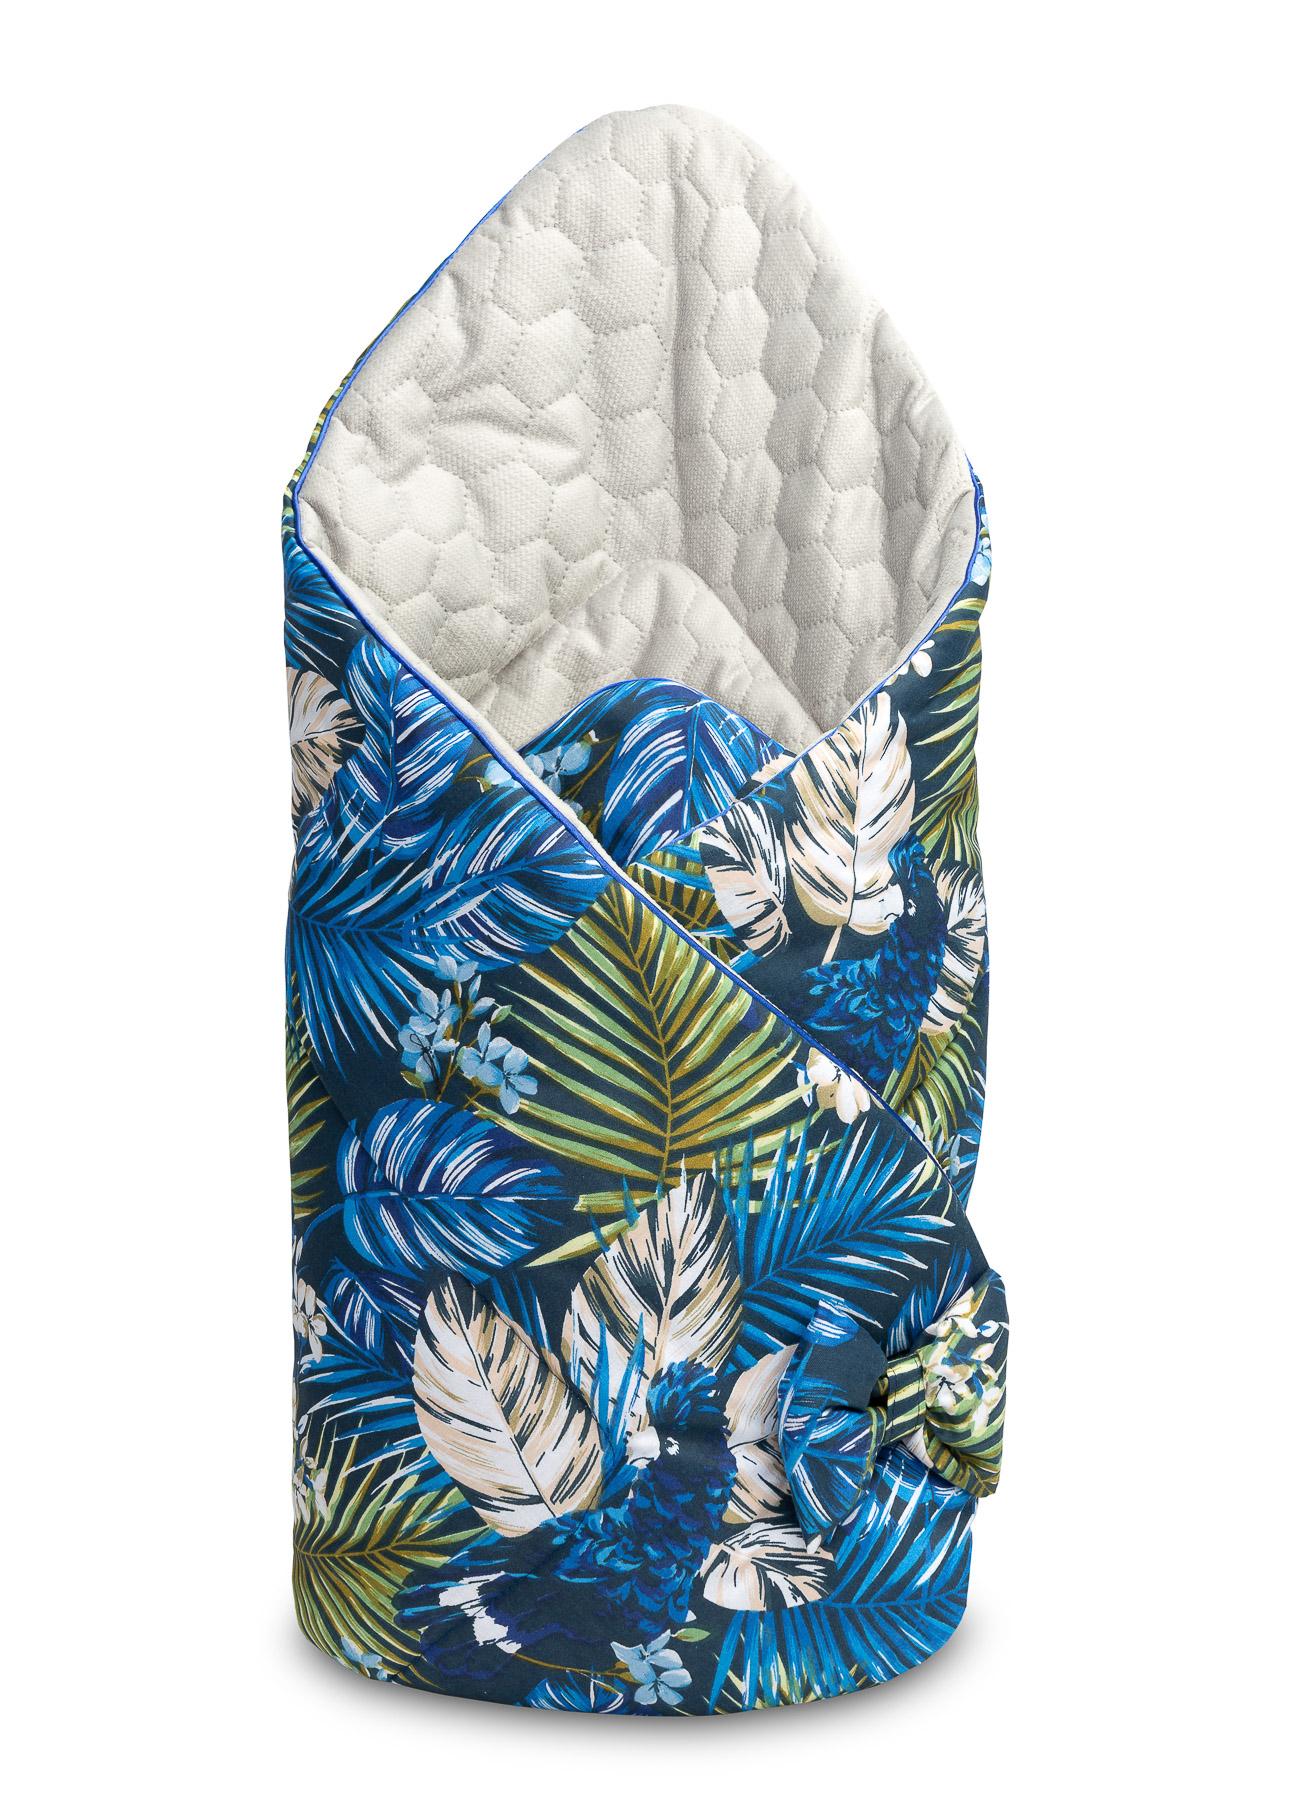 Rożek Velvet – Niebieski papugi